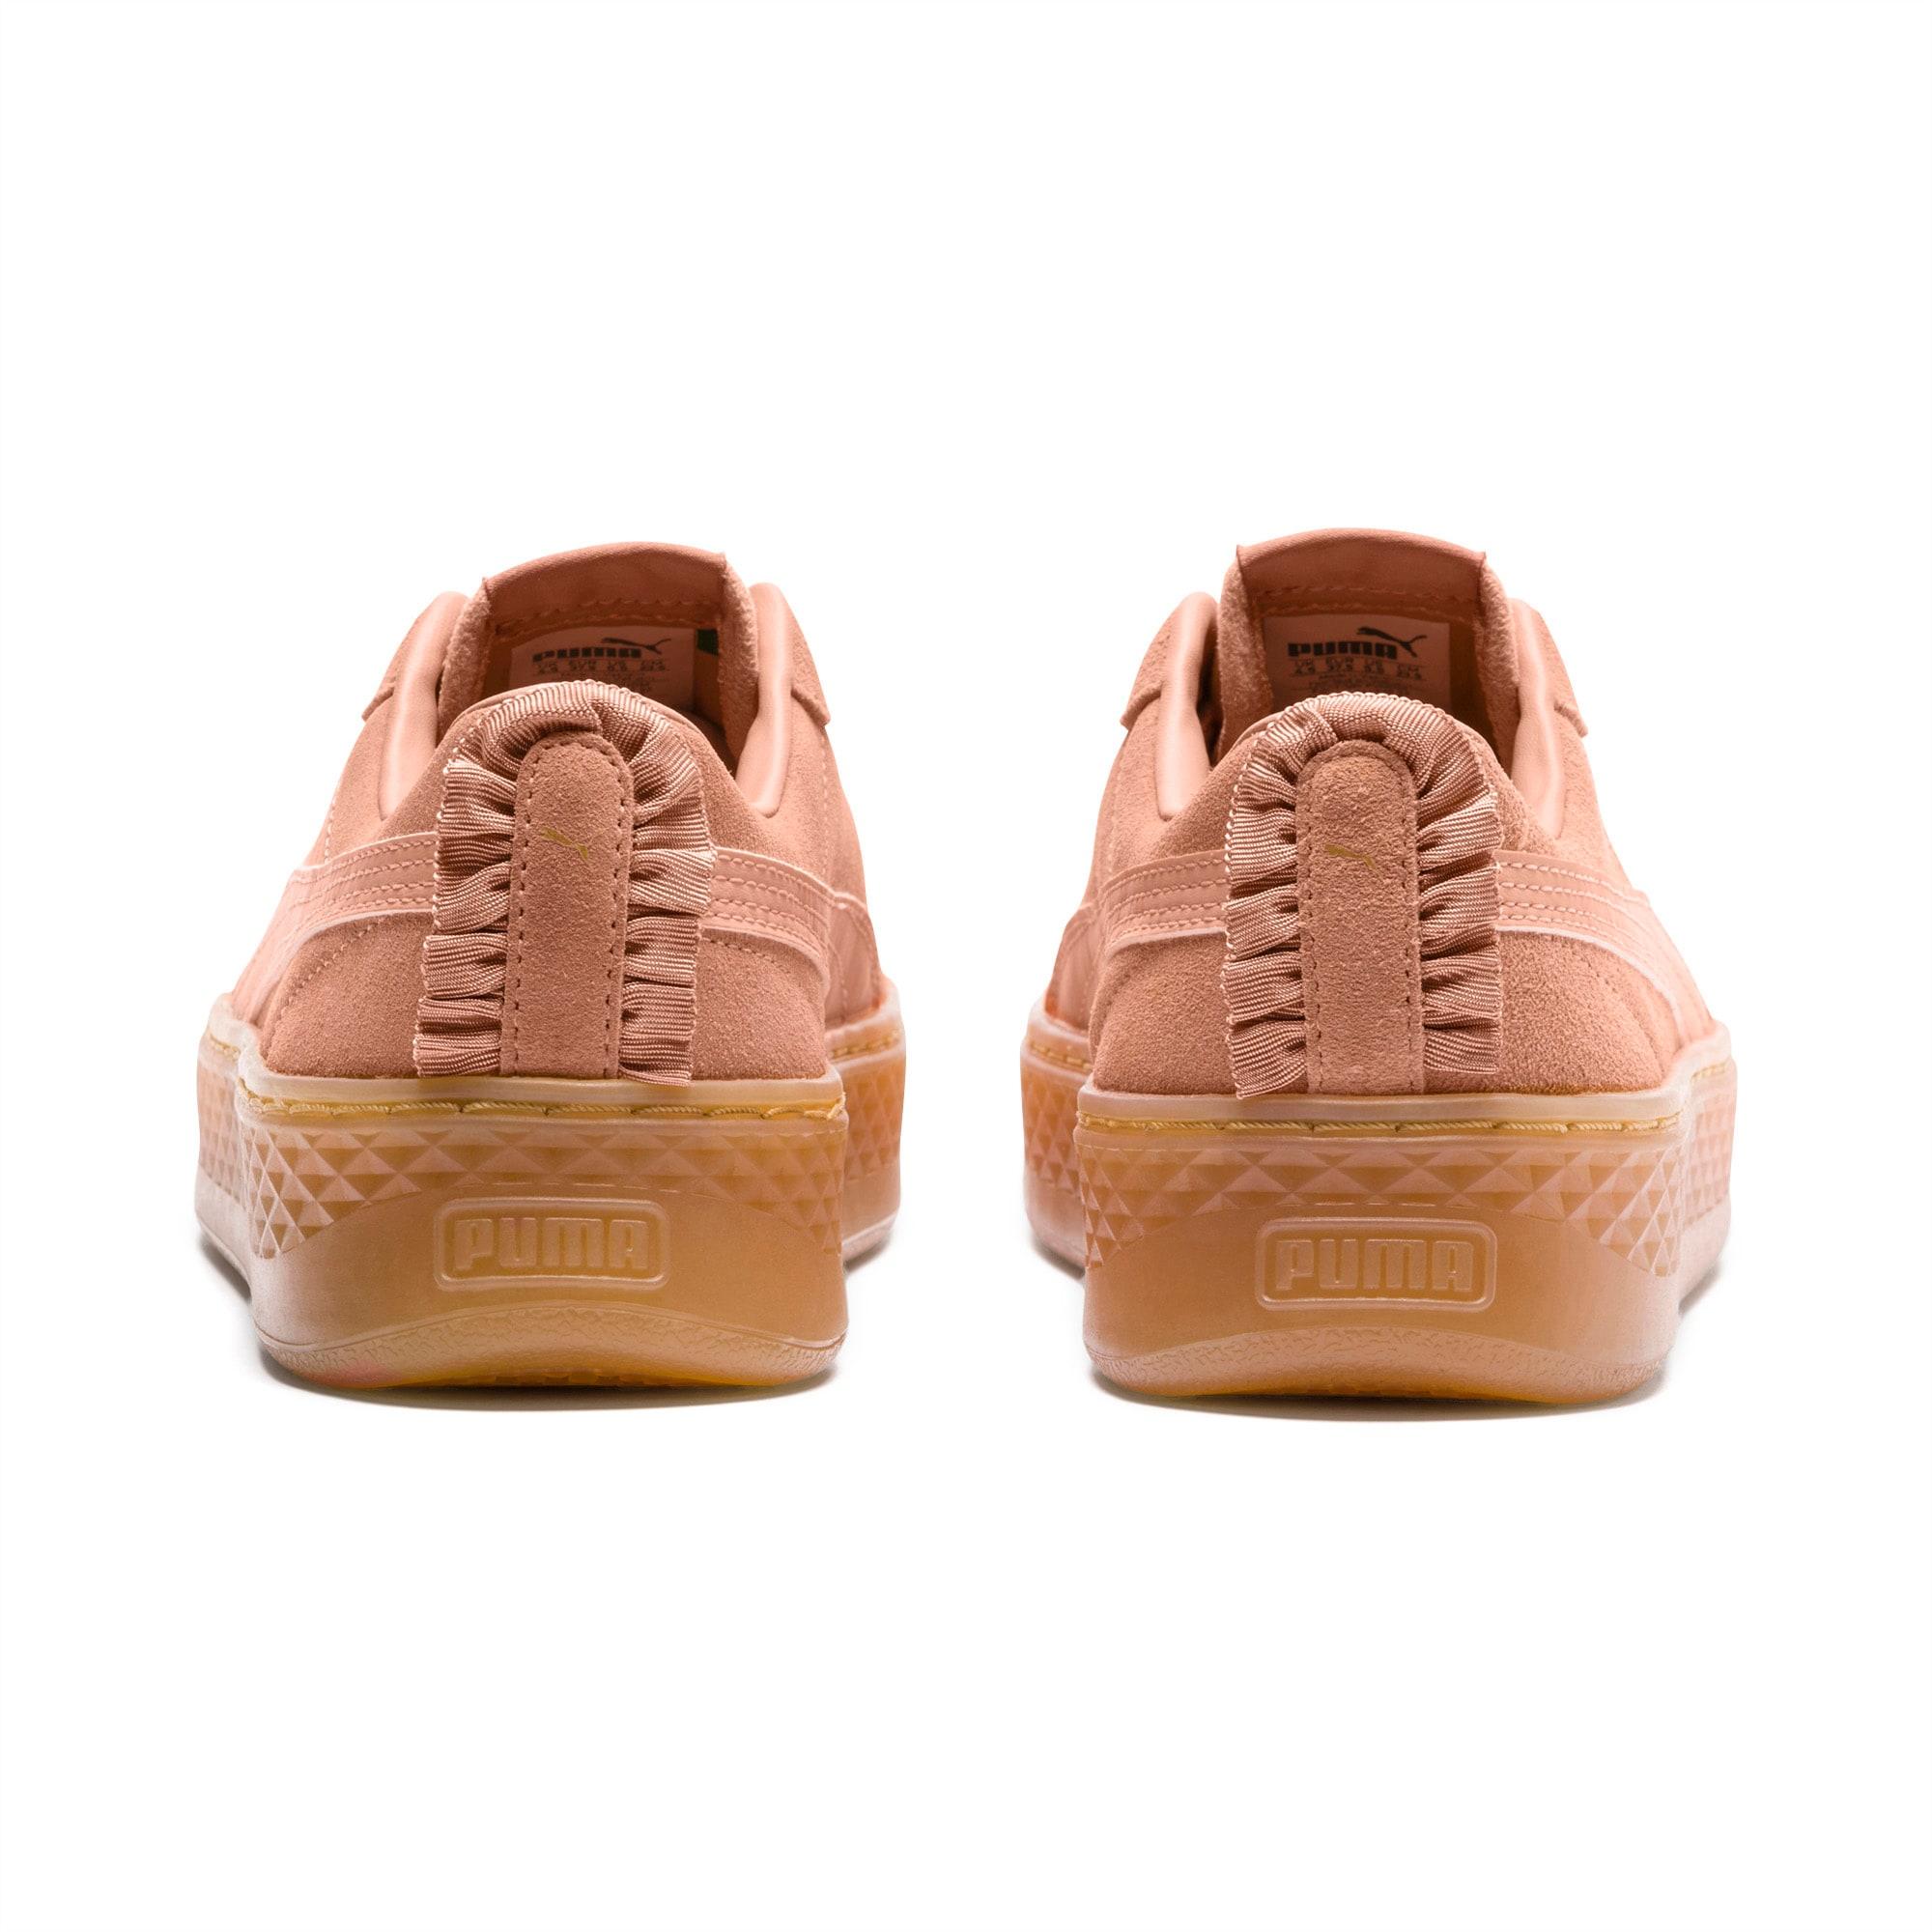 PUMA, Smash Platform Frill Sneakers Low, creme | mirapodo